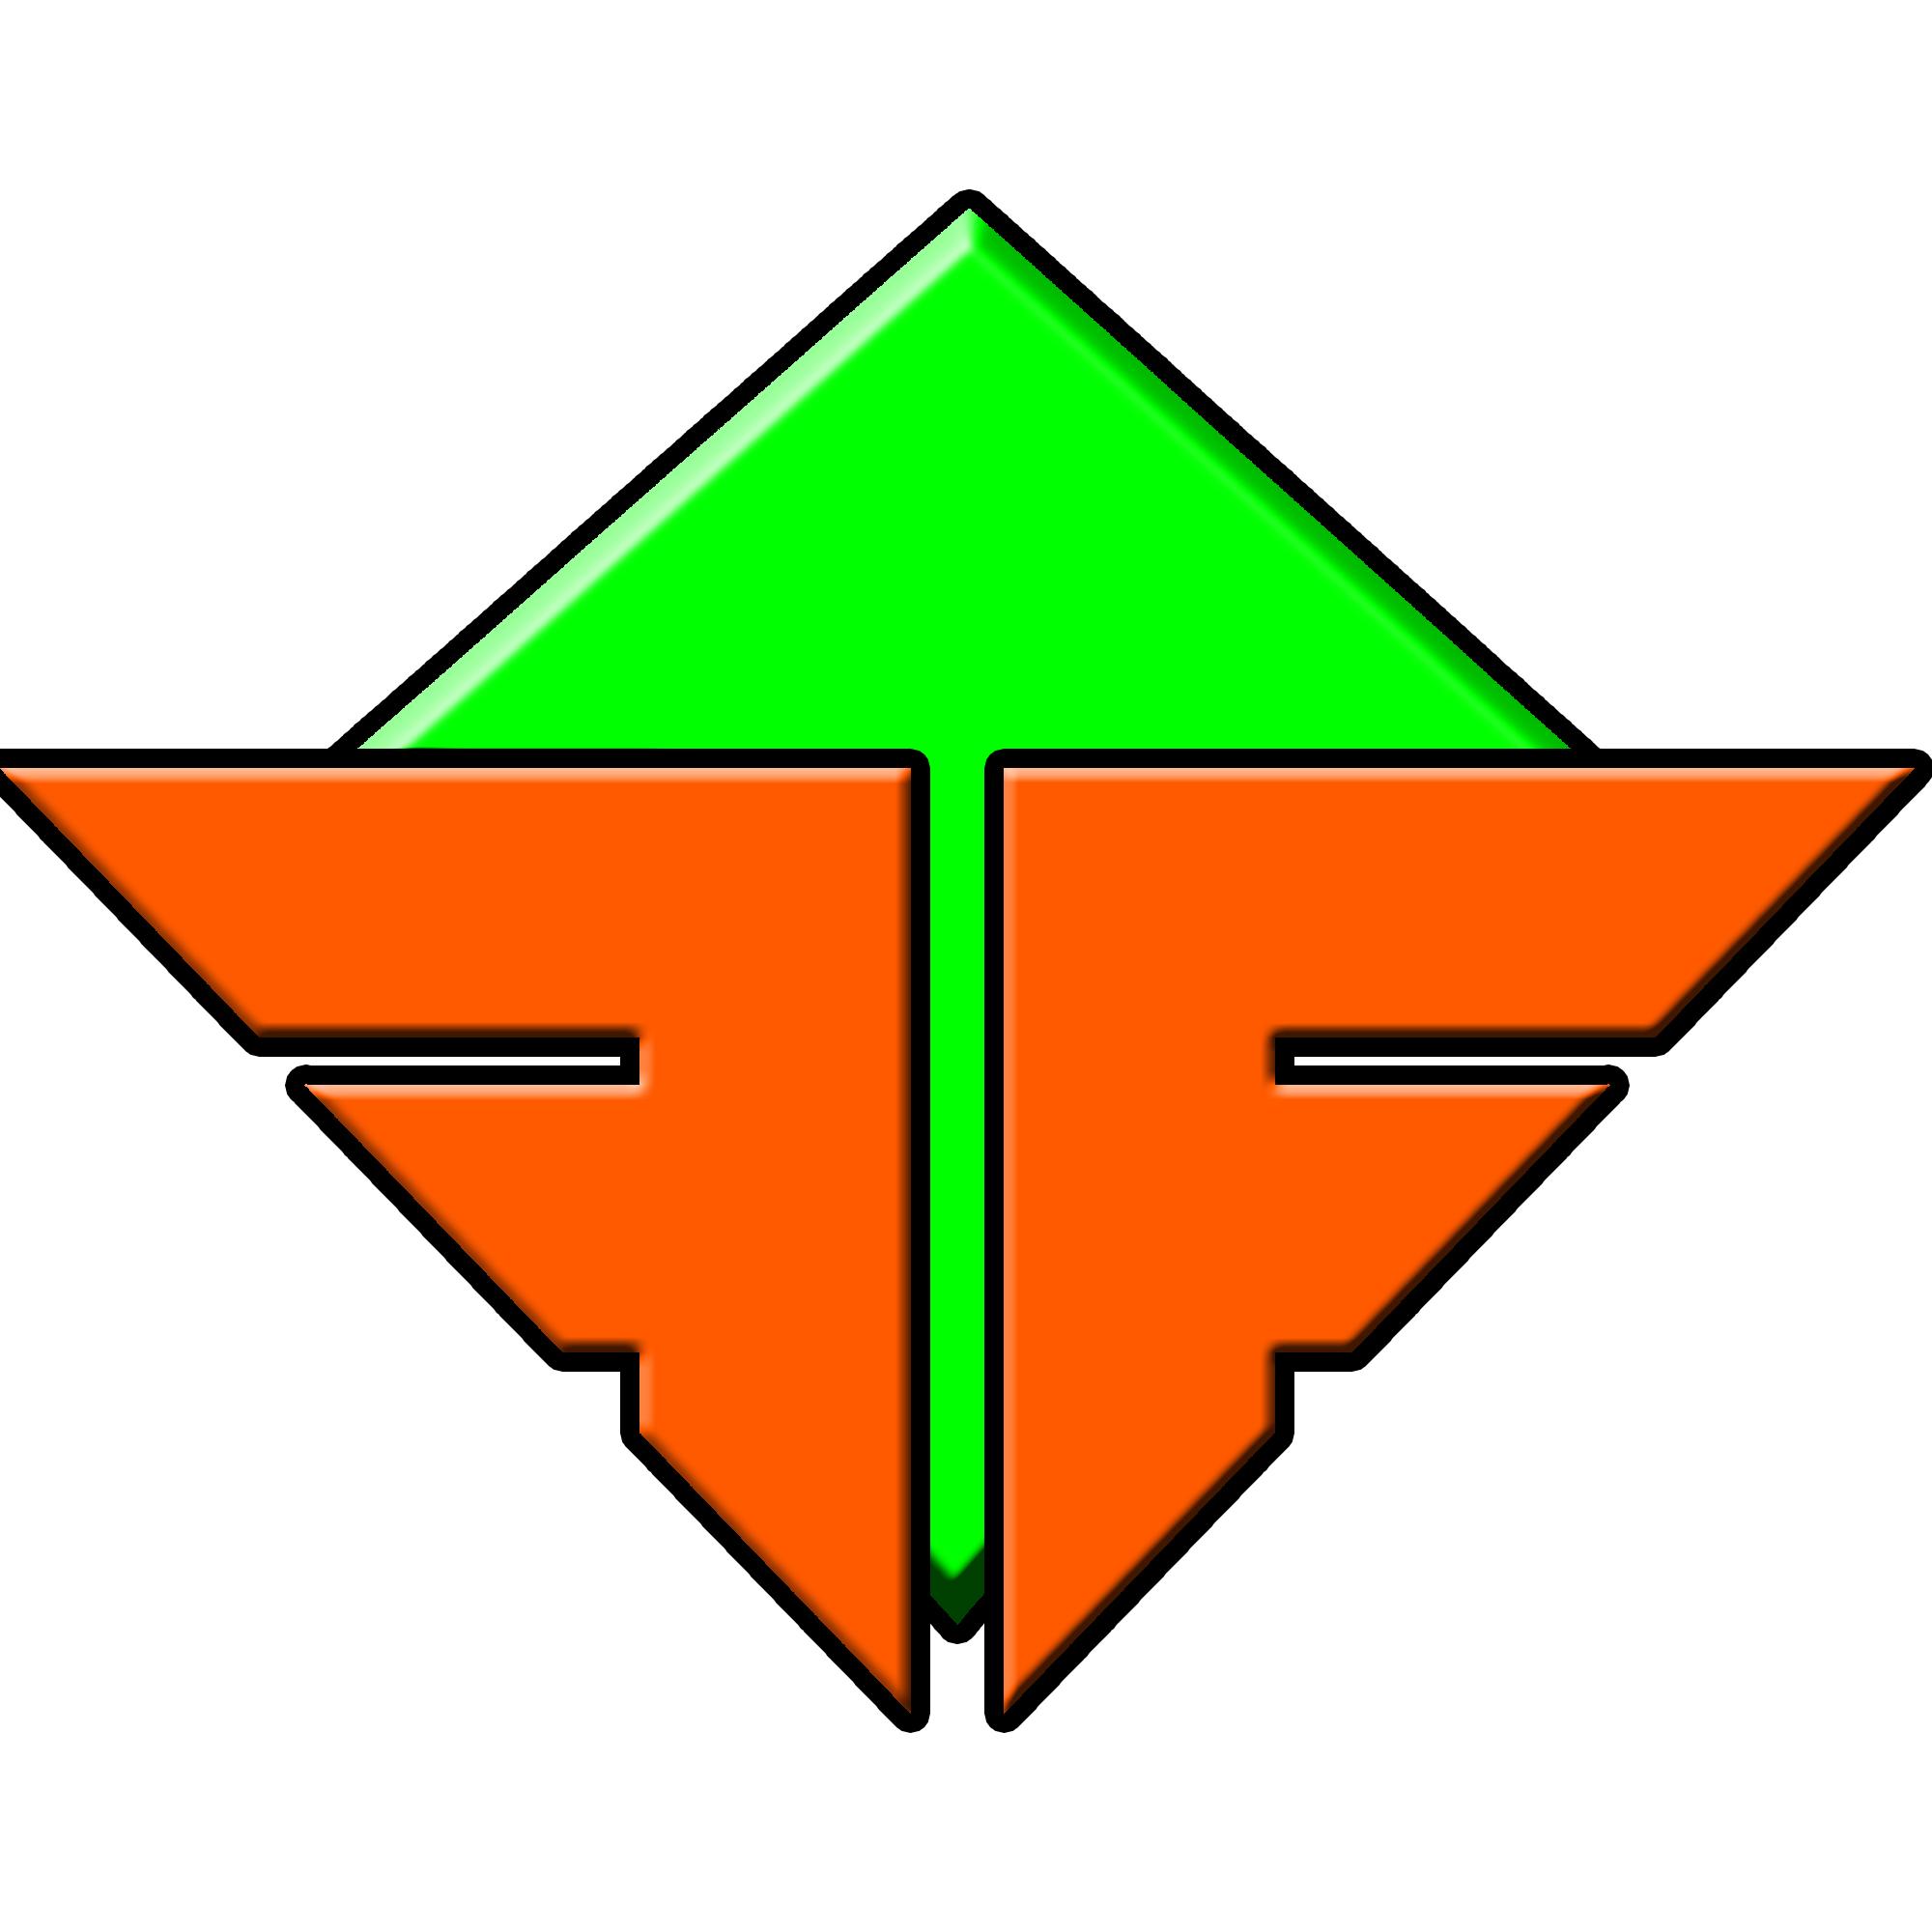 Разработка логотипа для компании FxFinance фото f_810511519eb044cf.jpg